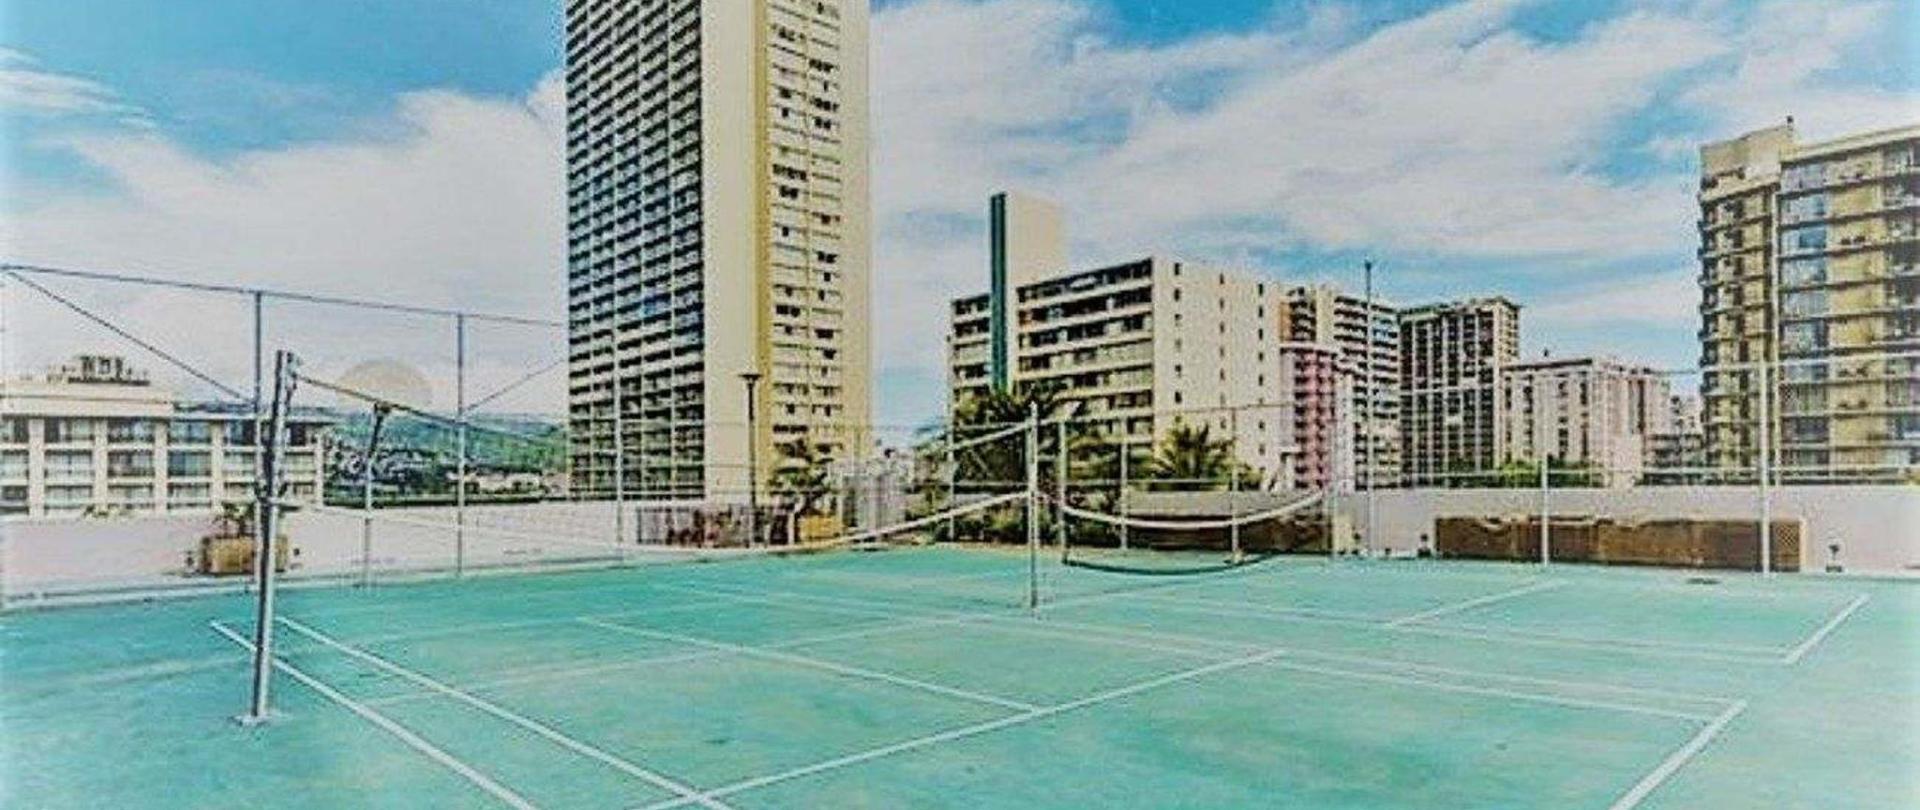 basketball-1-1.jpg